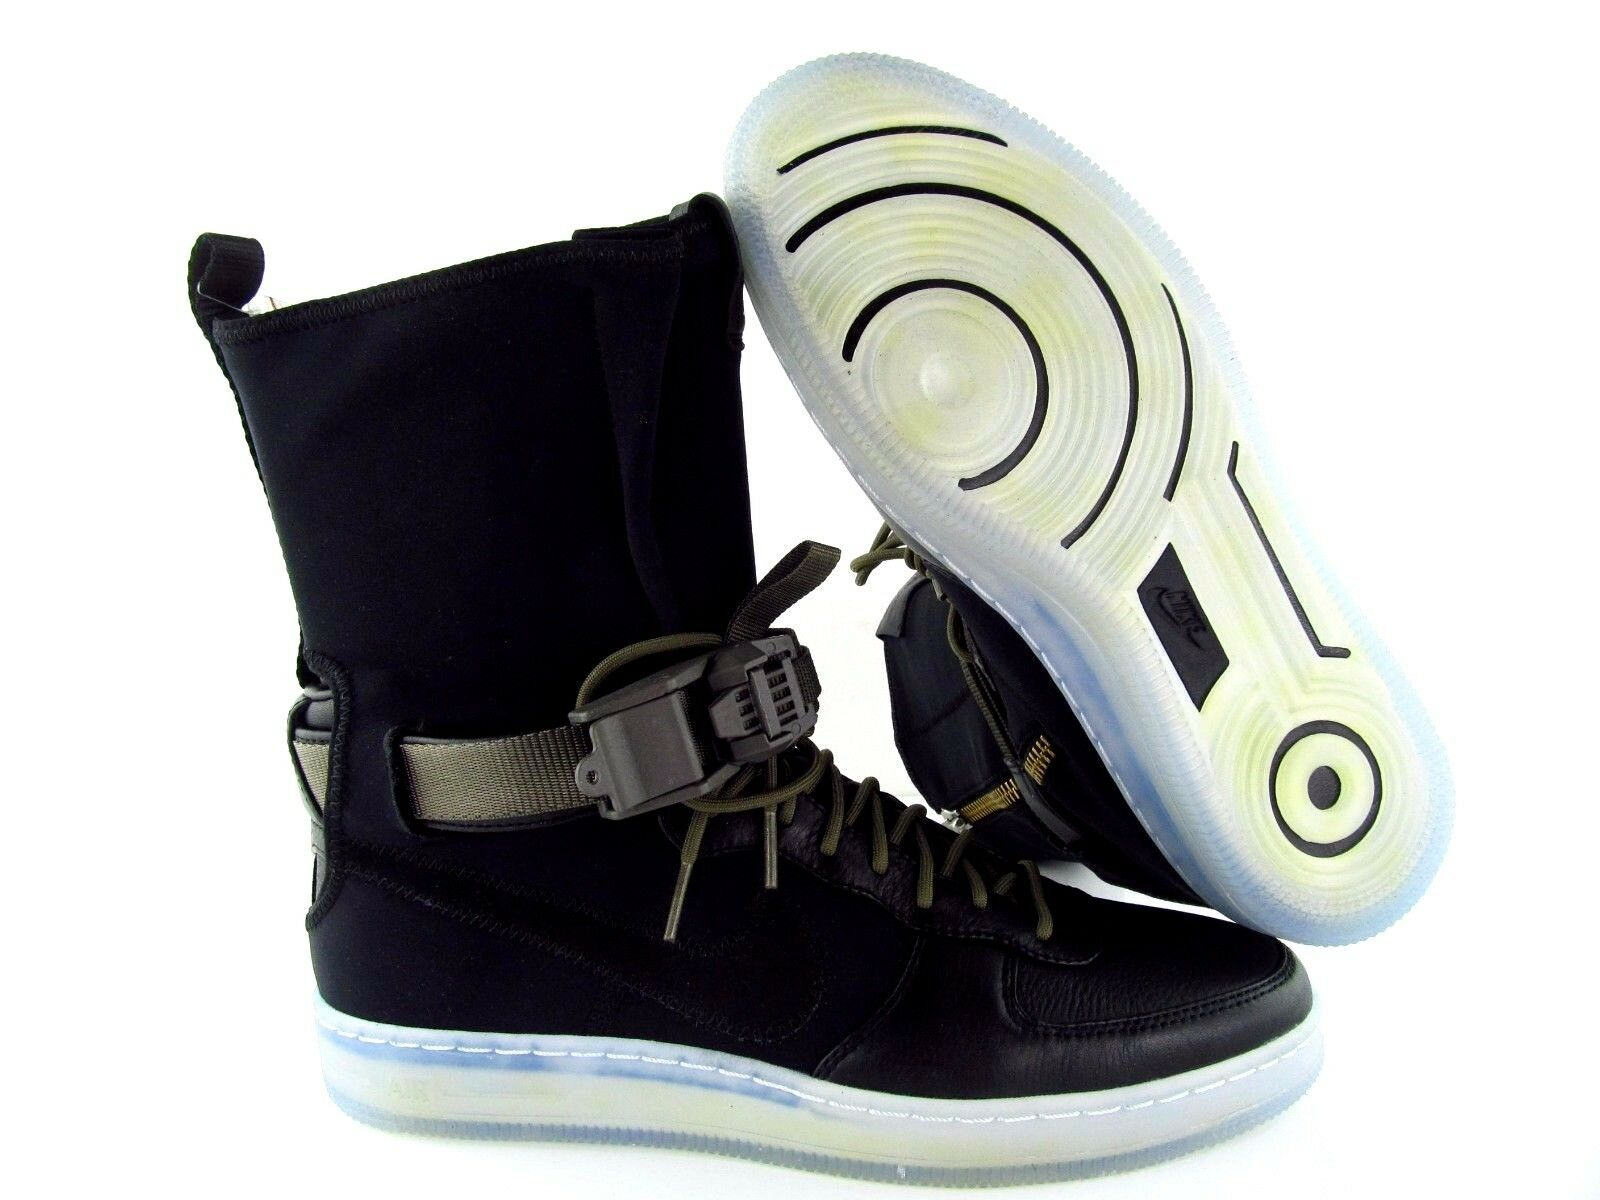 Nike Downtown Air Force 1 AF1 Downtown Nike HI SP / Acronym Black Olive UK_6 US_7 3e133e